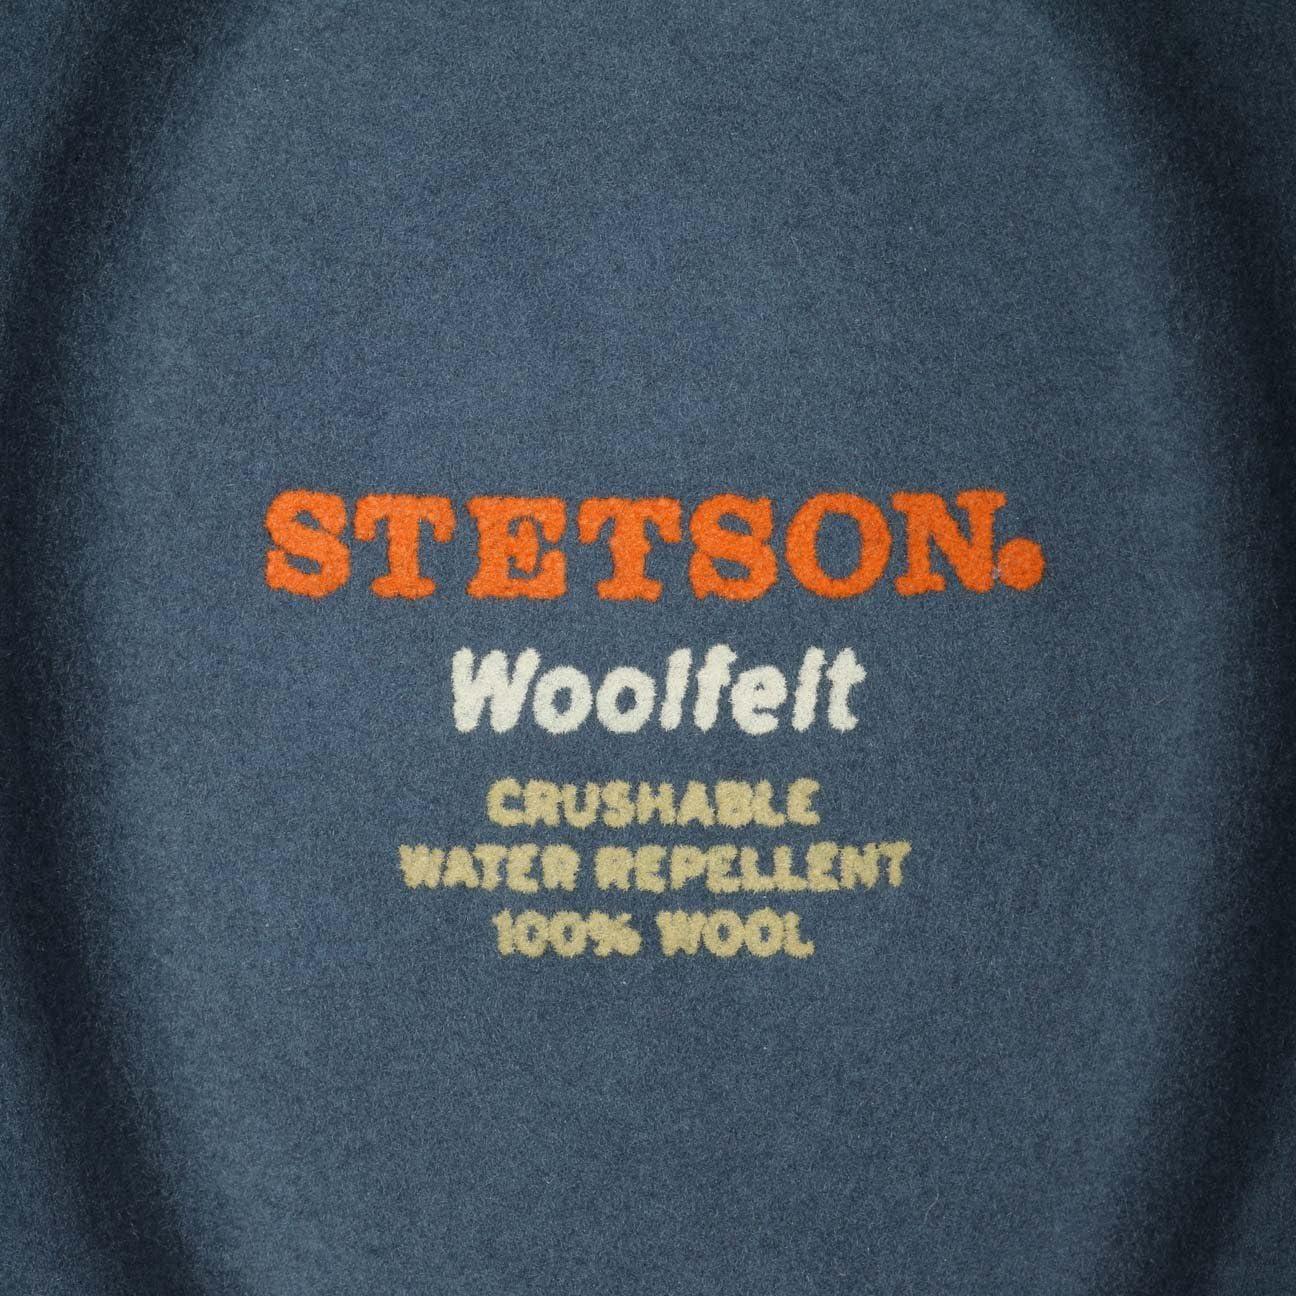 Herrenhut Packable Wollfilzhut Sommer//Winter Asahi Guard/® Hut aus Wollfilz Stetson Richmond Trilby Damen//Herren - Filzhut Wasserabweisend